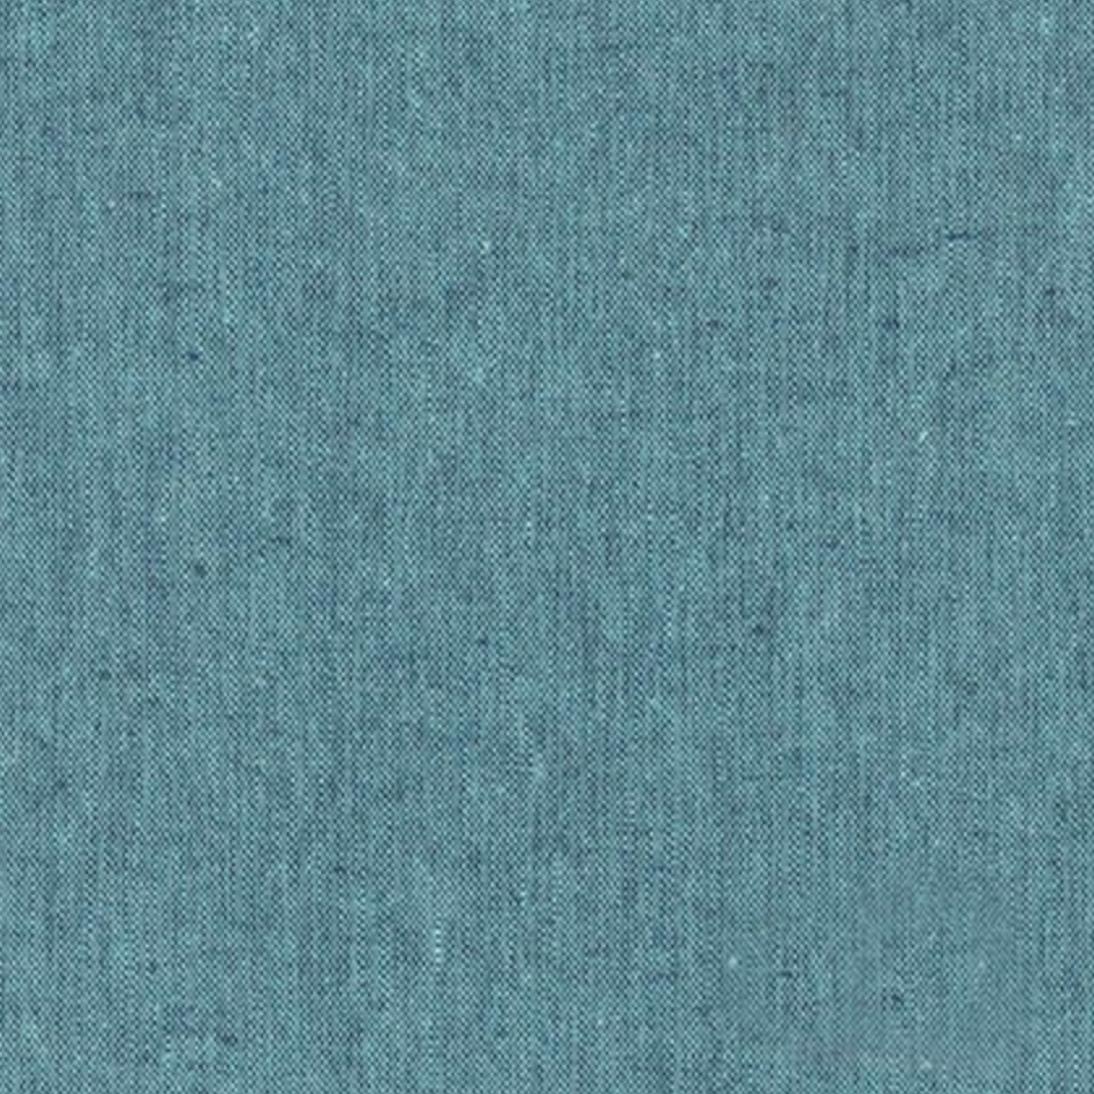 Essex Yarn Dyed - Malibu - Robert Kaufman